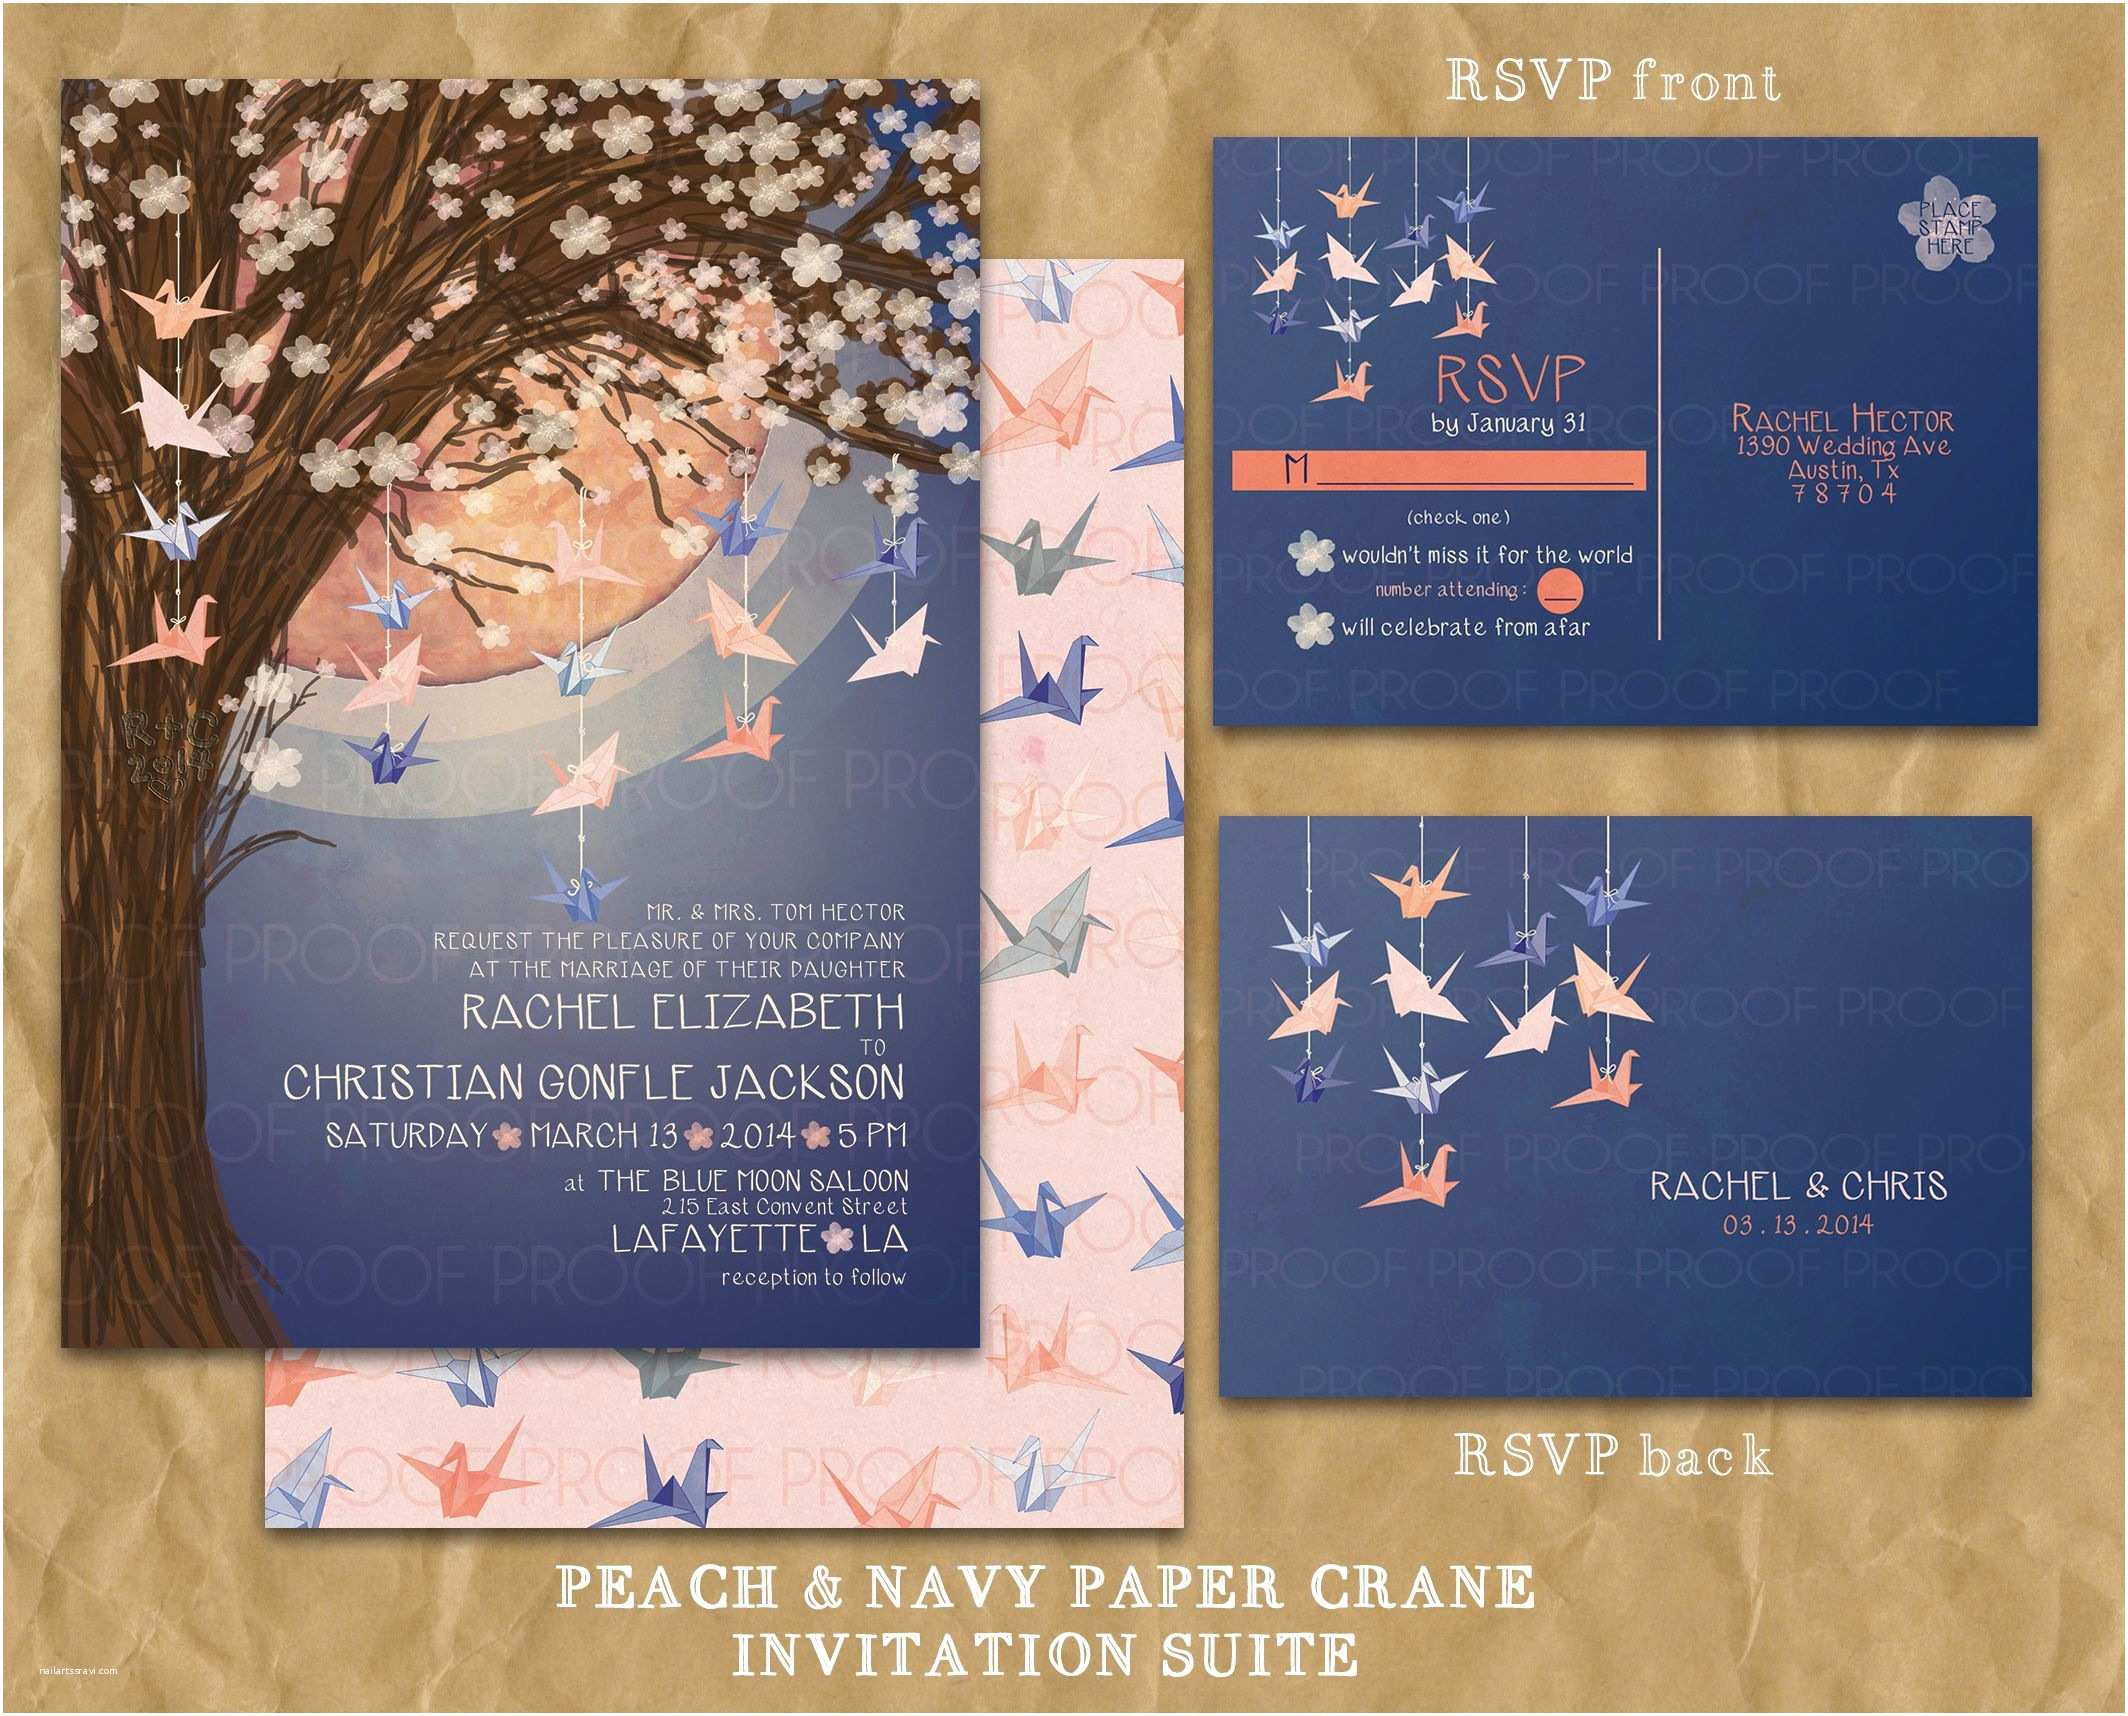 Crane Wedding Invitations Paper Crane Moon Wedding Invitation Navy and Peach